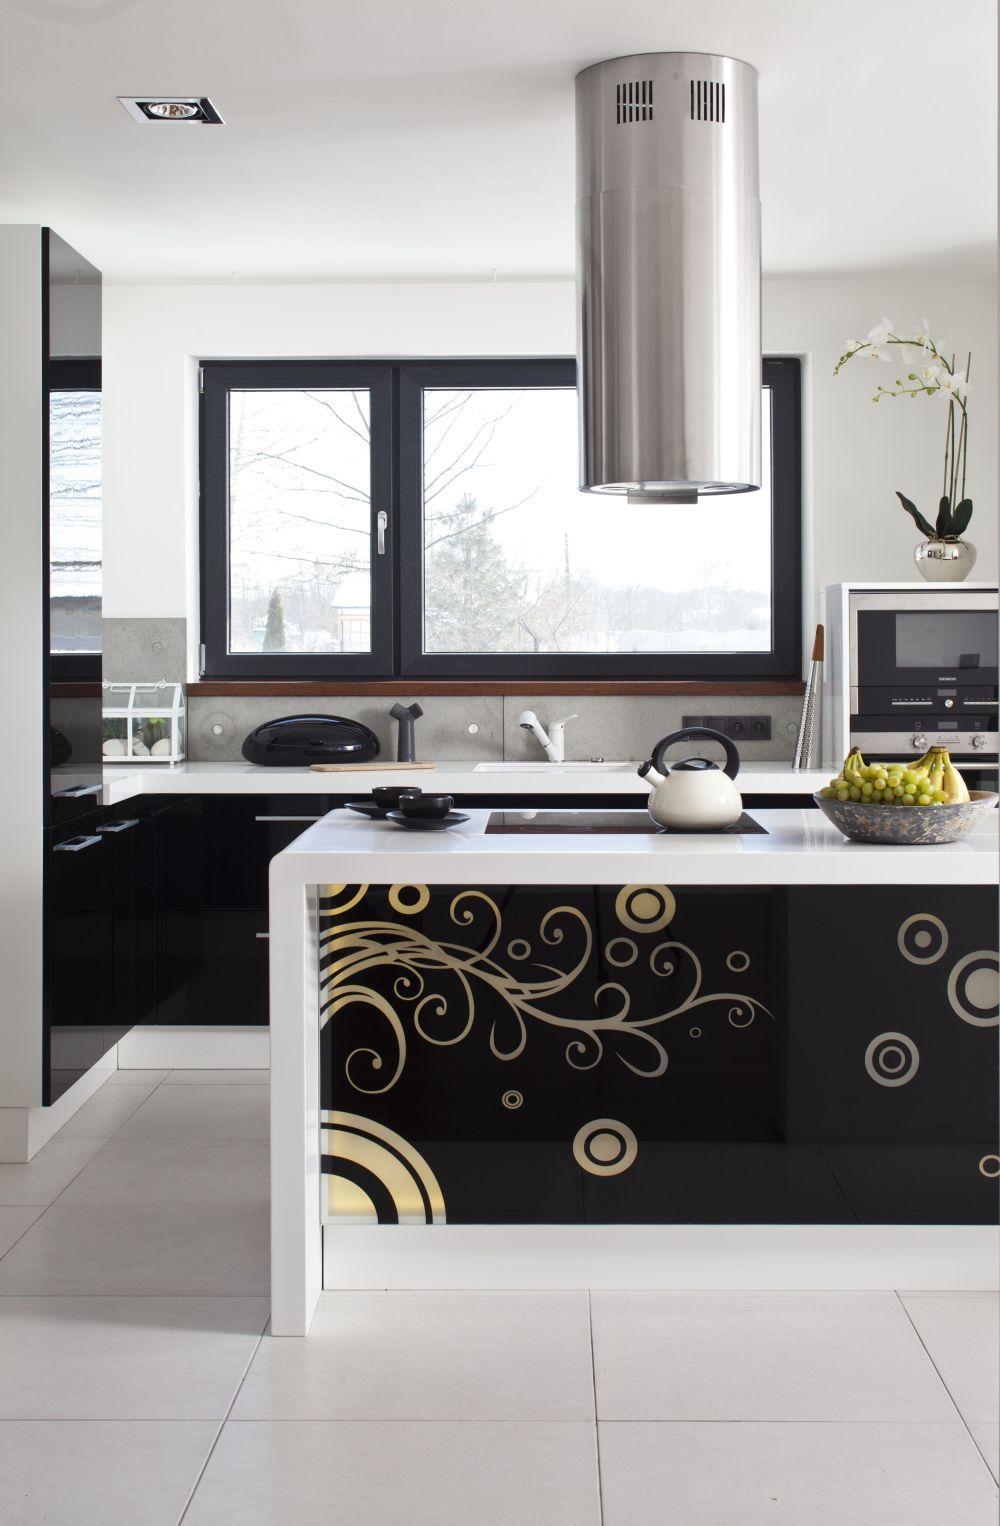 Elegancka Czarno Biala Kuchnia Projekt Kuchni Z Wyspa 10 M2 Modern Kitchen Kitchen Home Decor